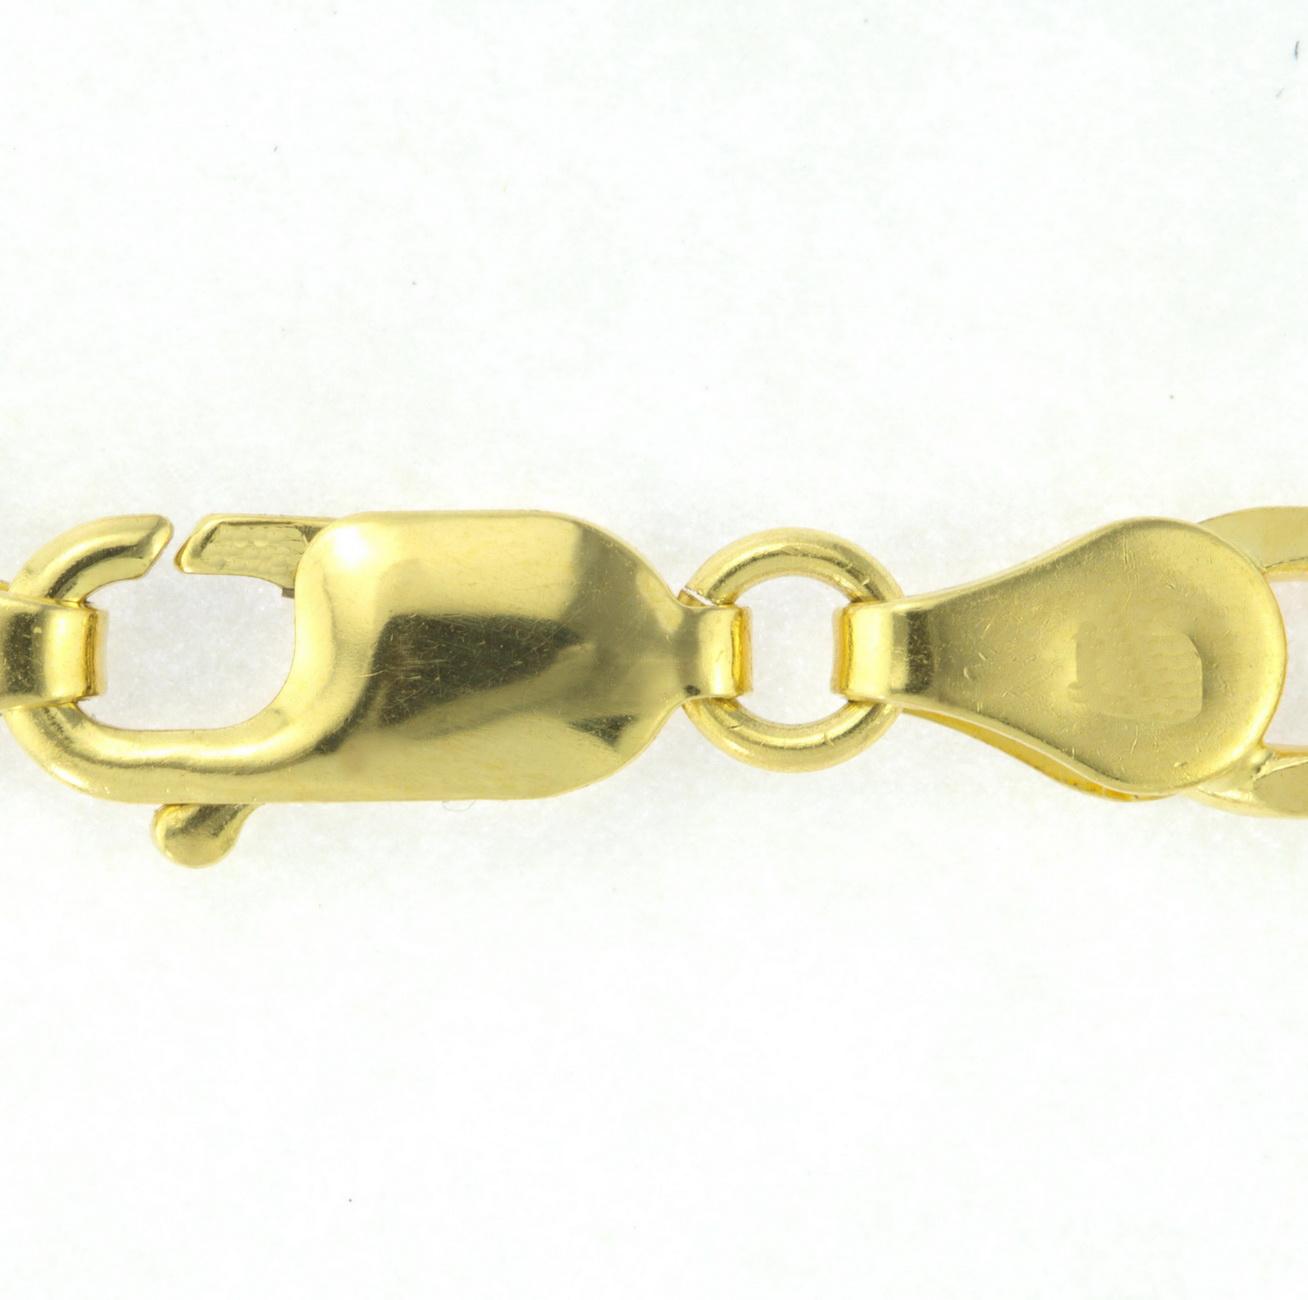 10K-Yellow-Gold-Italian-Figaro-Chain-Link-Bracelet-Mens-Women-2mm-9mm-7-034-8-034-9-034 thumbnail 11